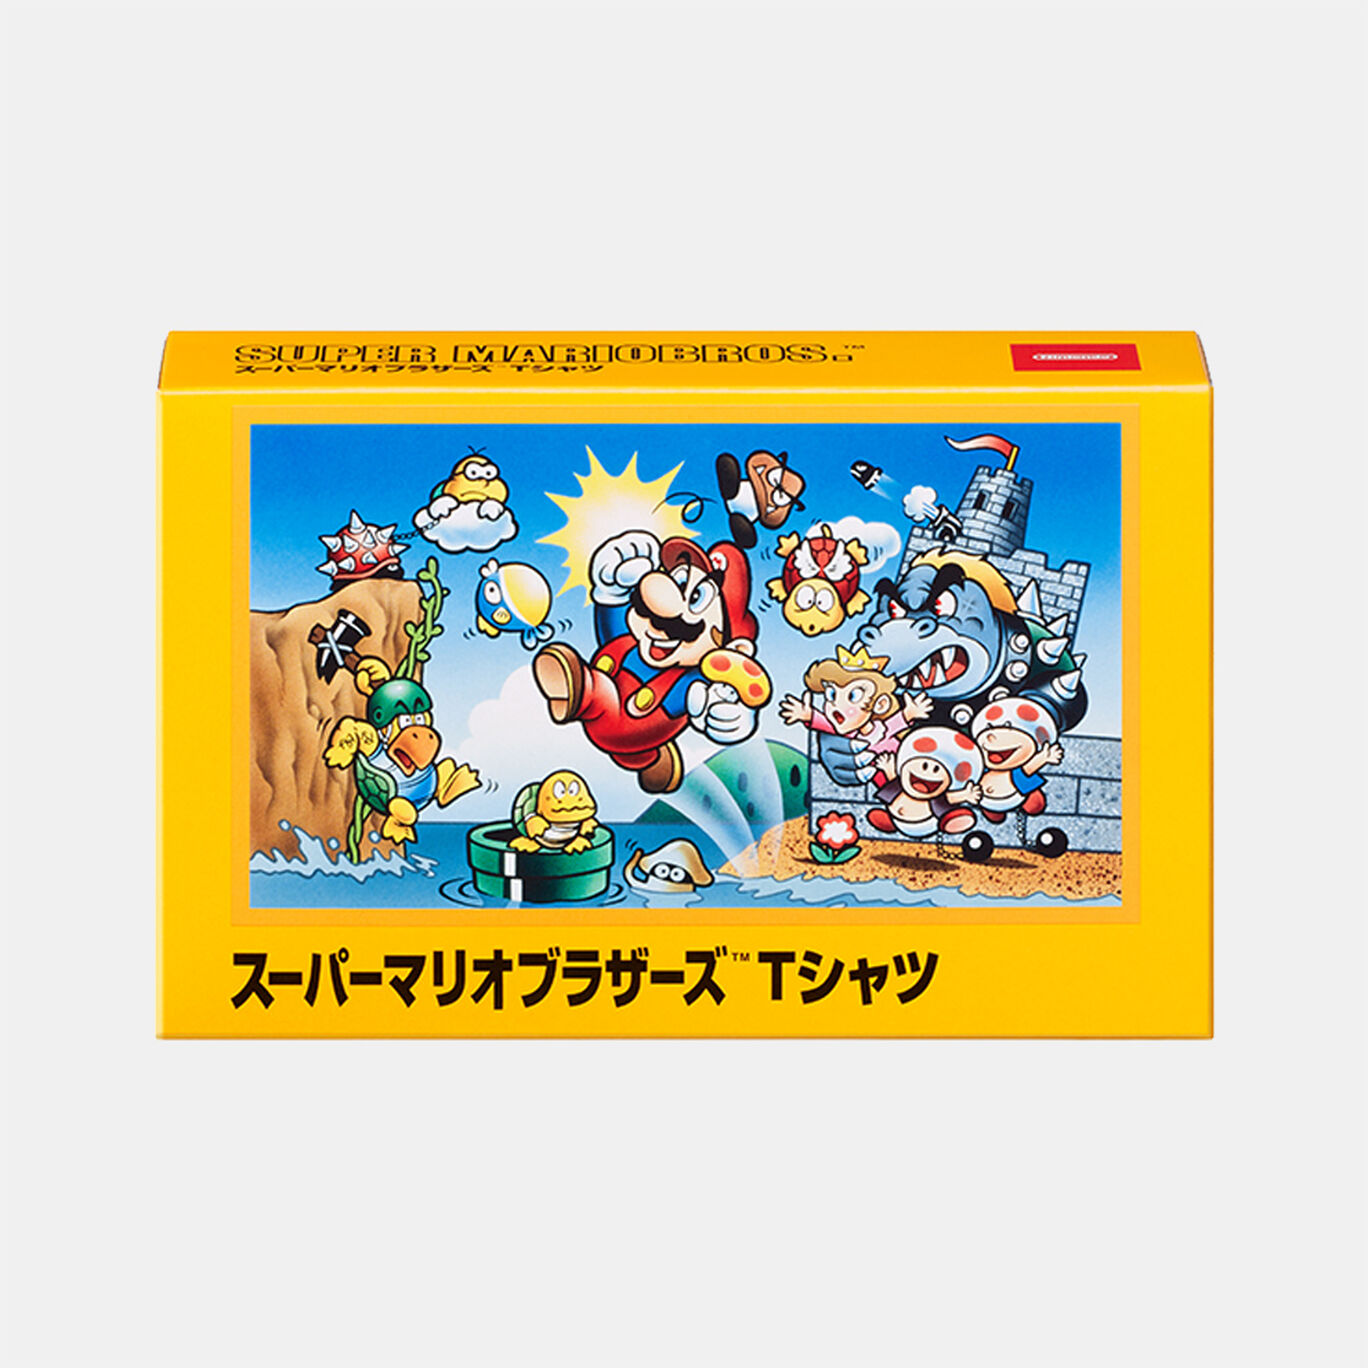 Tシャツ スーパーマリオブラザーズ L【Nintendo TOKYO取り扱い商品】